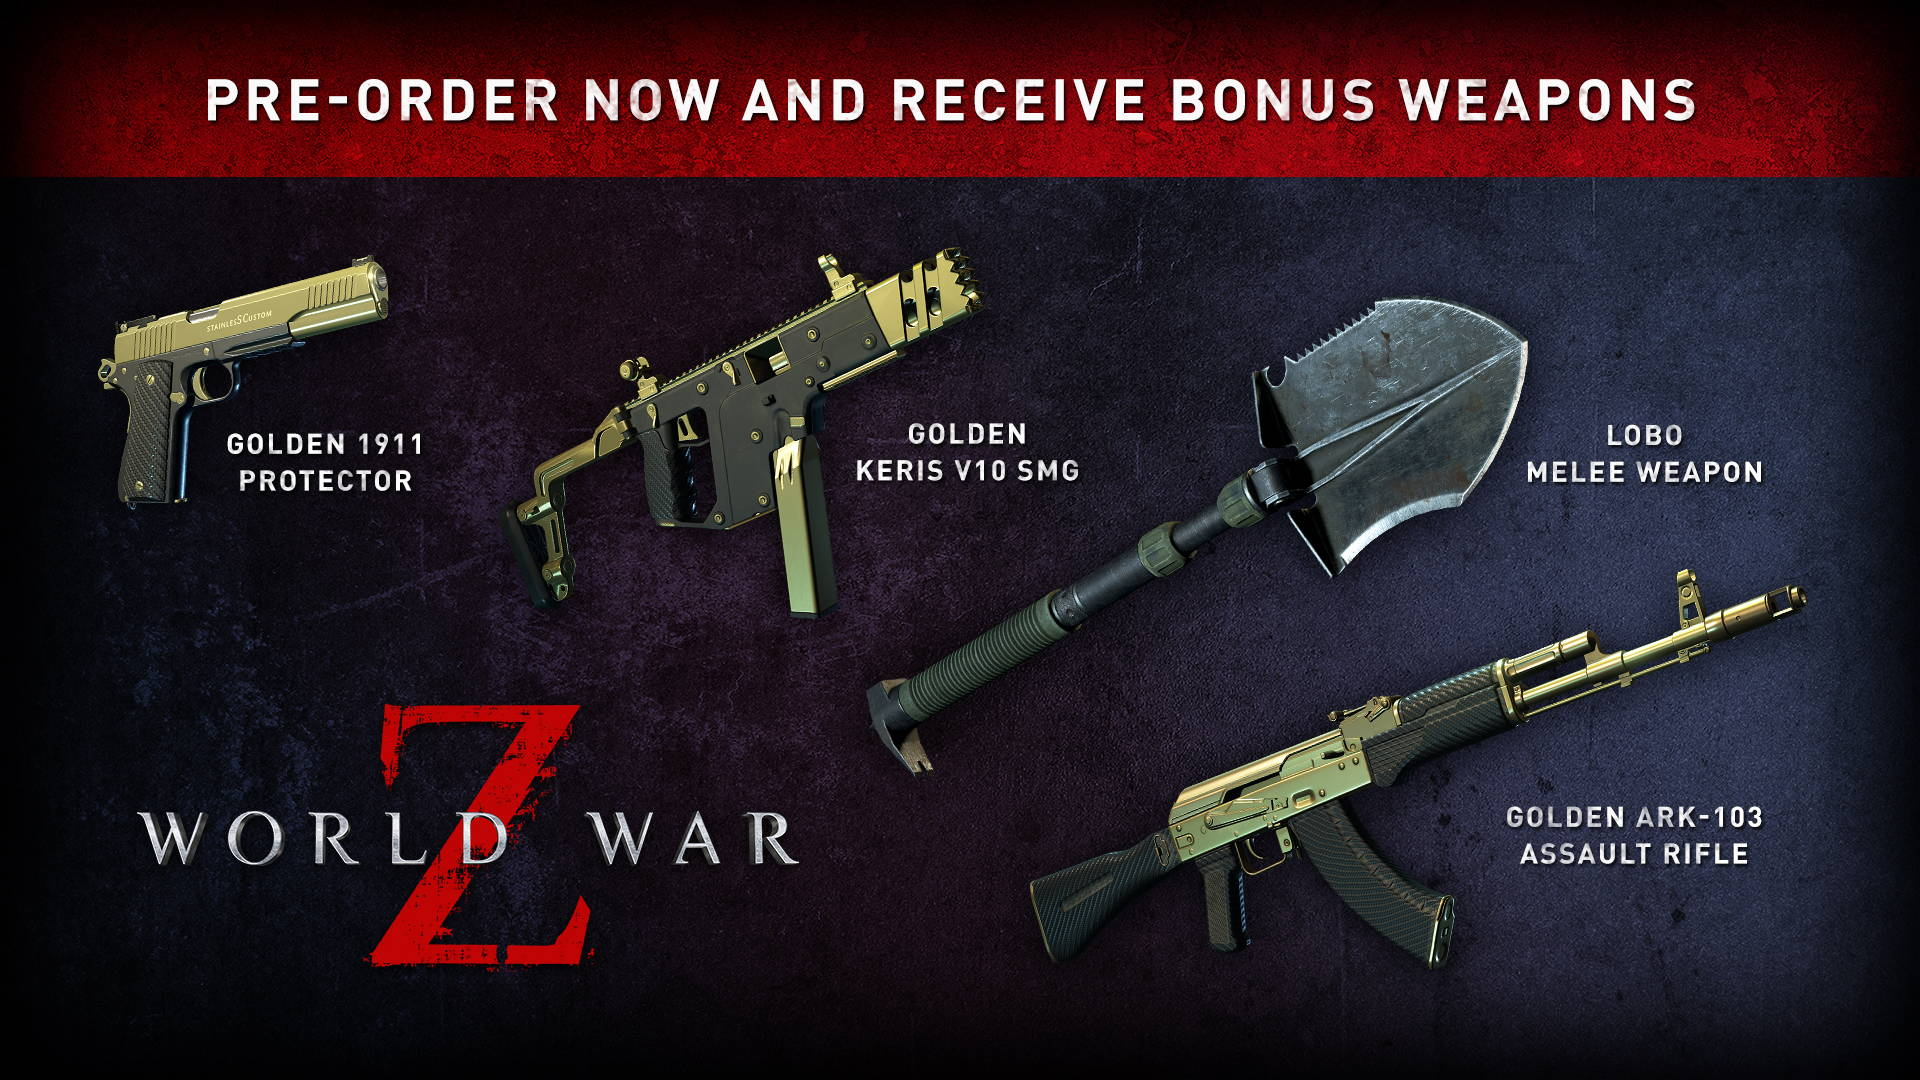 World War Z Pre-order Bonuses